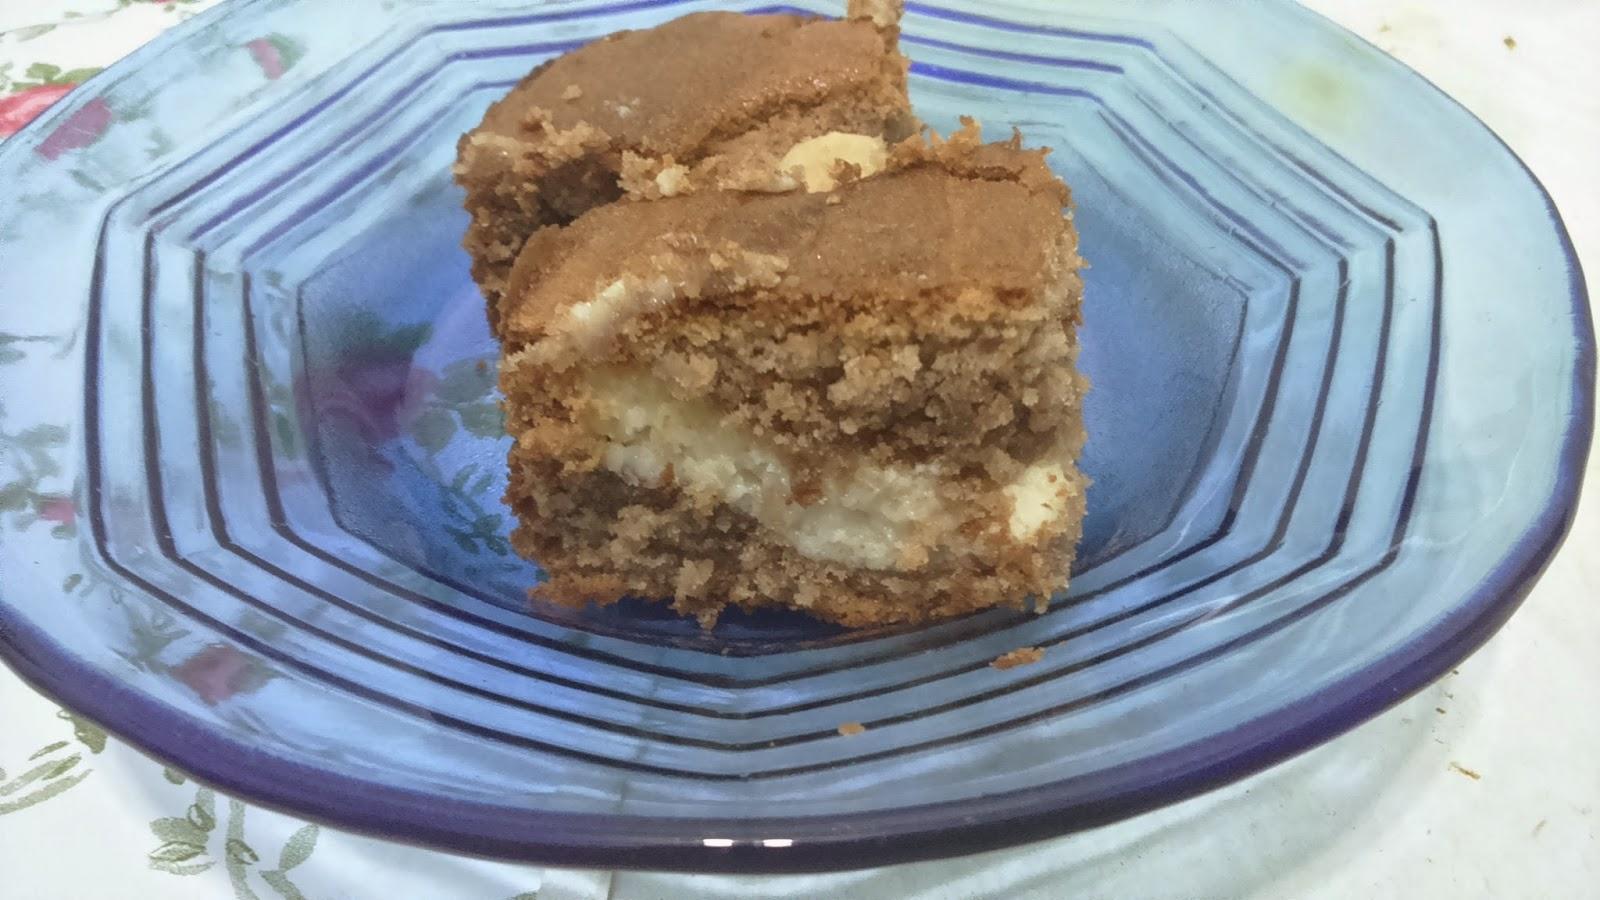 kak zebra, butter cake, butter cake lembut, resepi mudah, resepi ringkas, cepat dan mudah, cara mudah